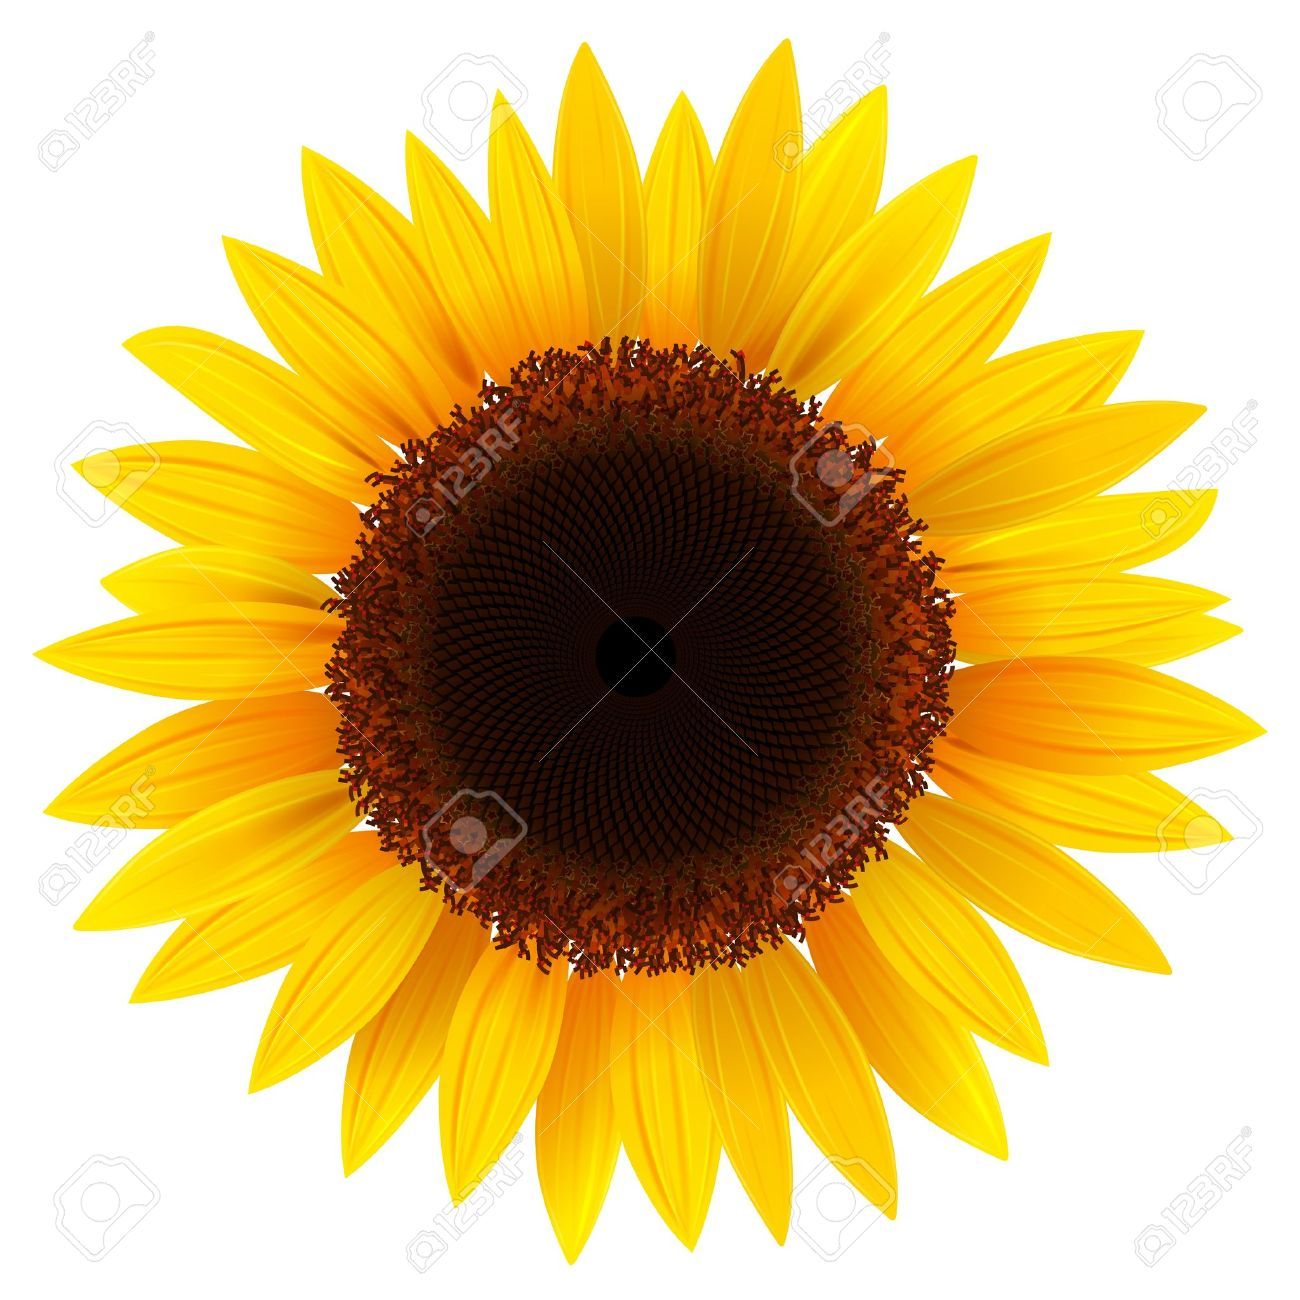 vector sunflower realistic illustration royalty free cliparts rh 123rf com sunflower vector free download sunflower vector free download